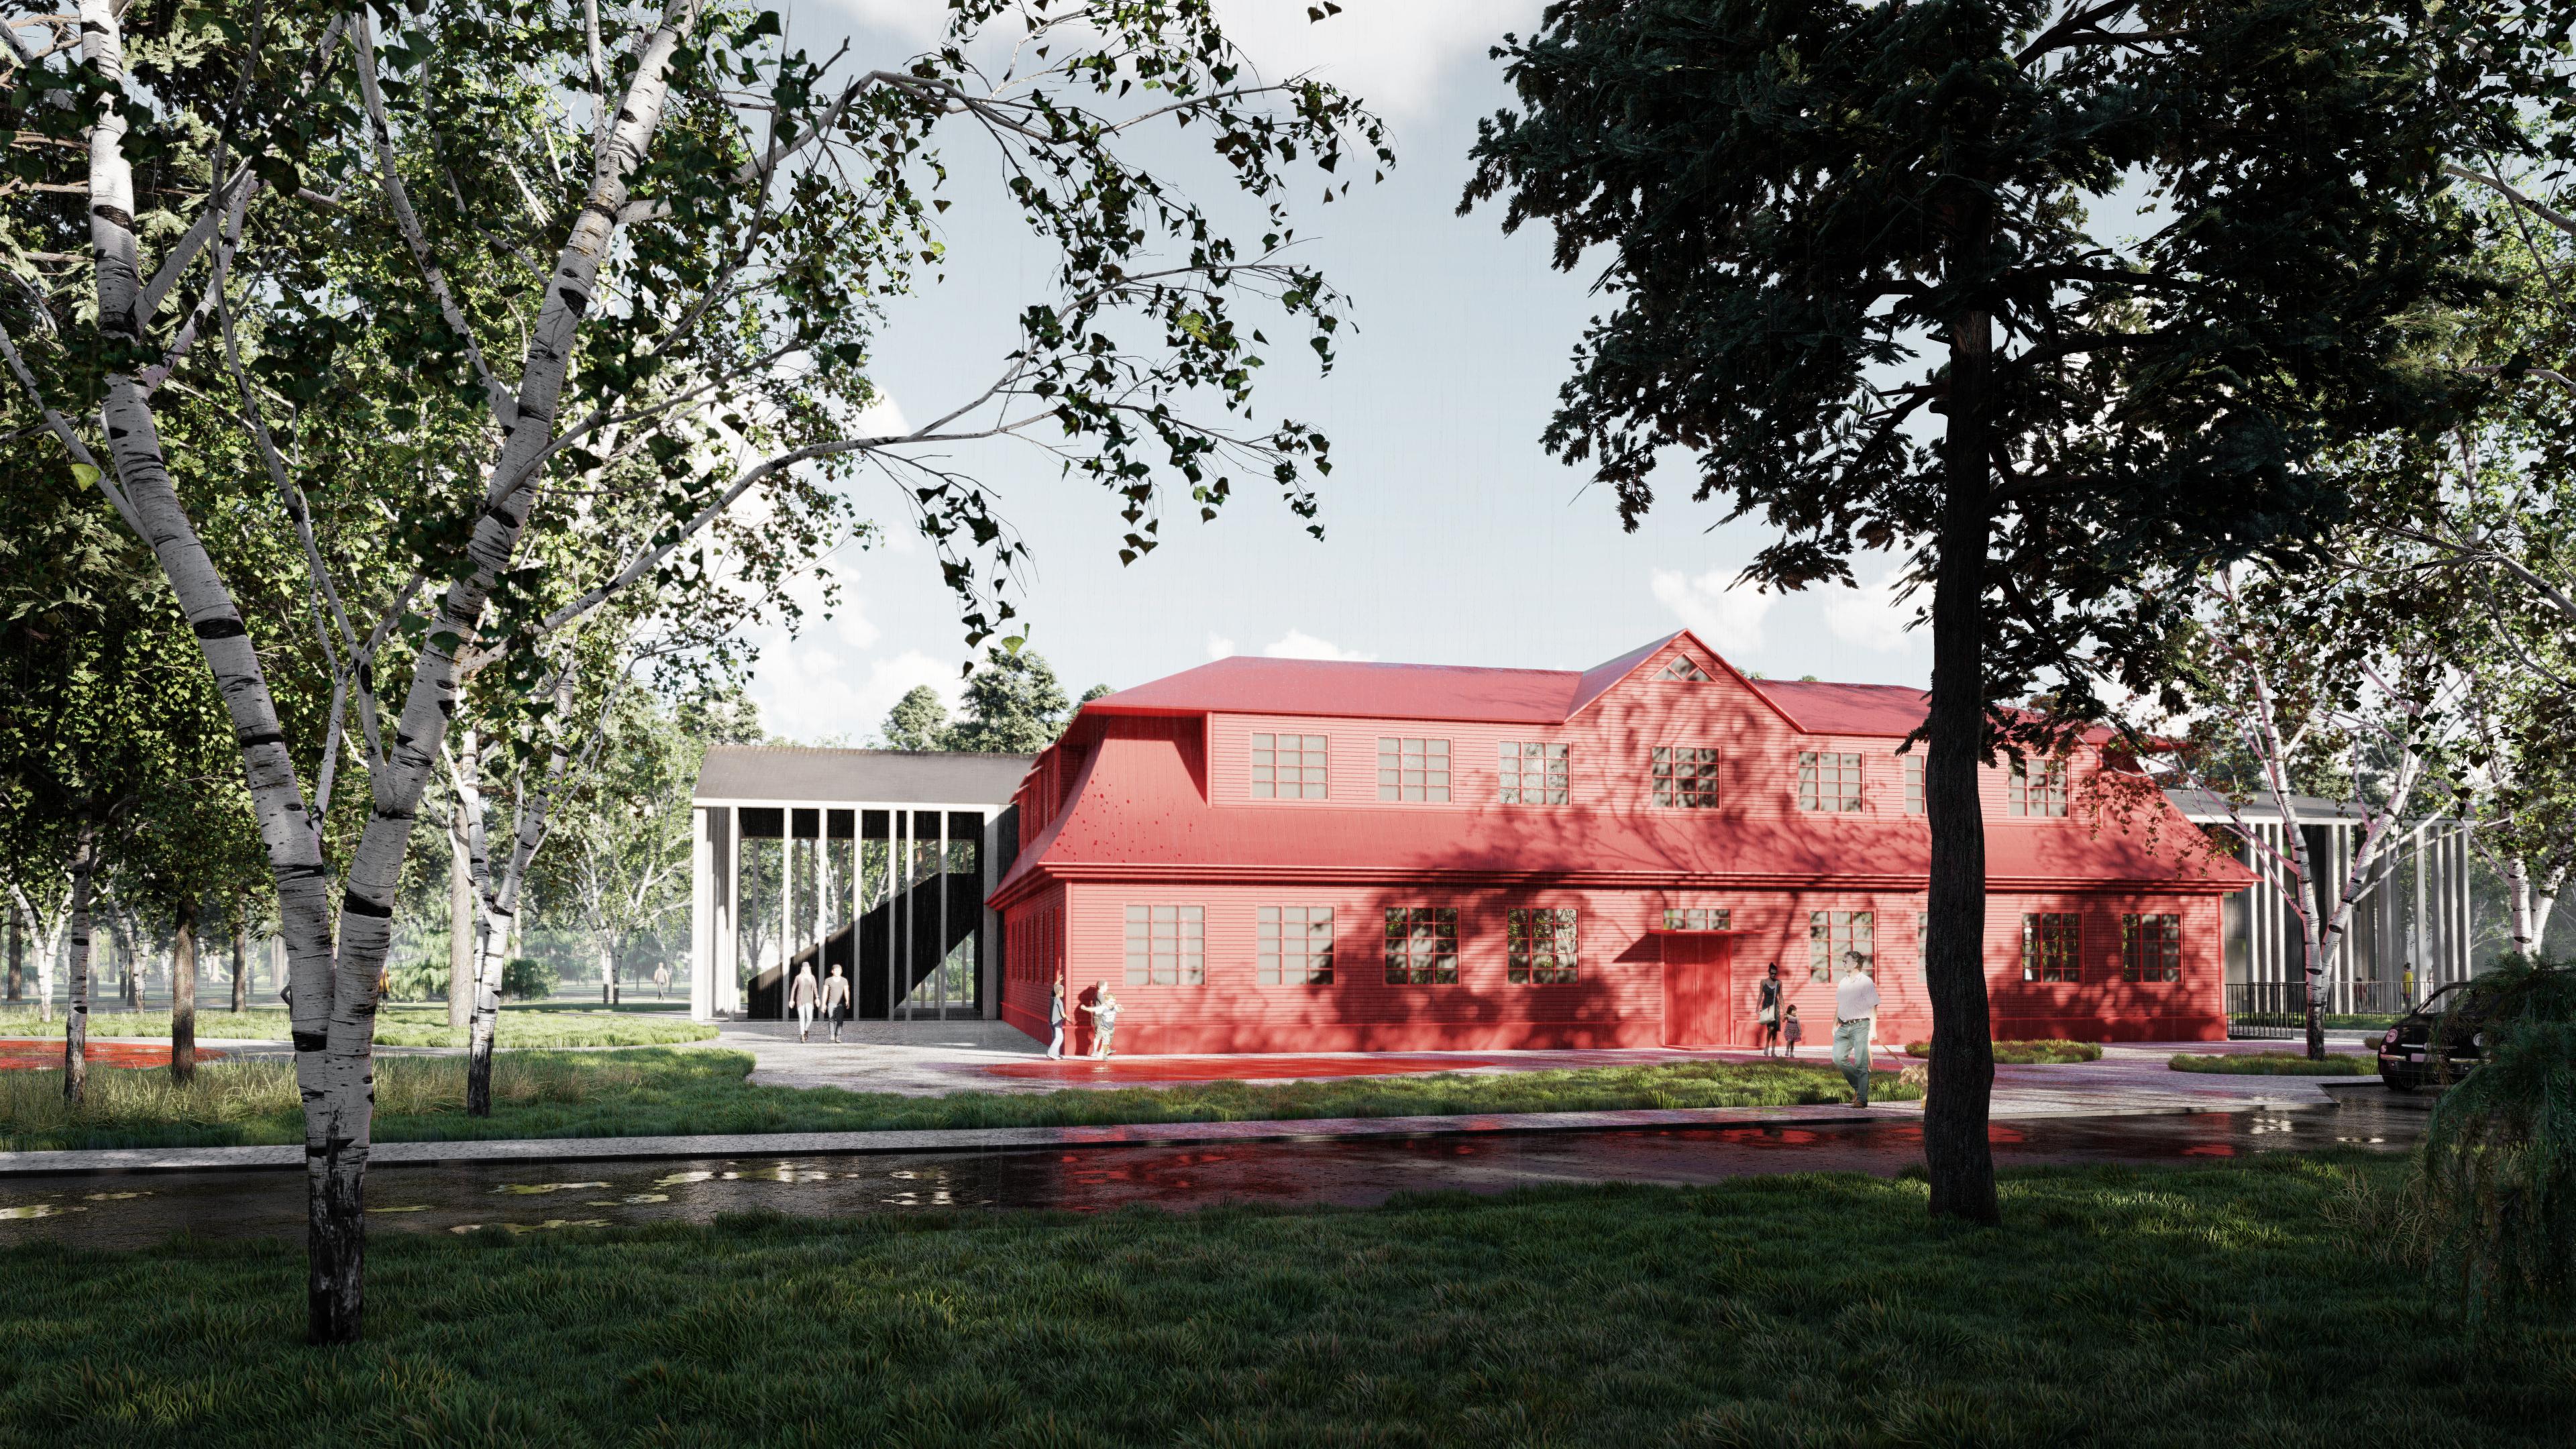 2019 Võsu Elementary School